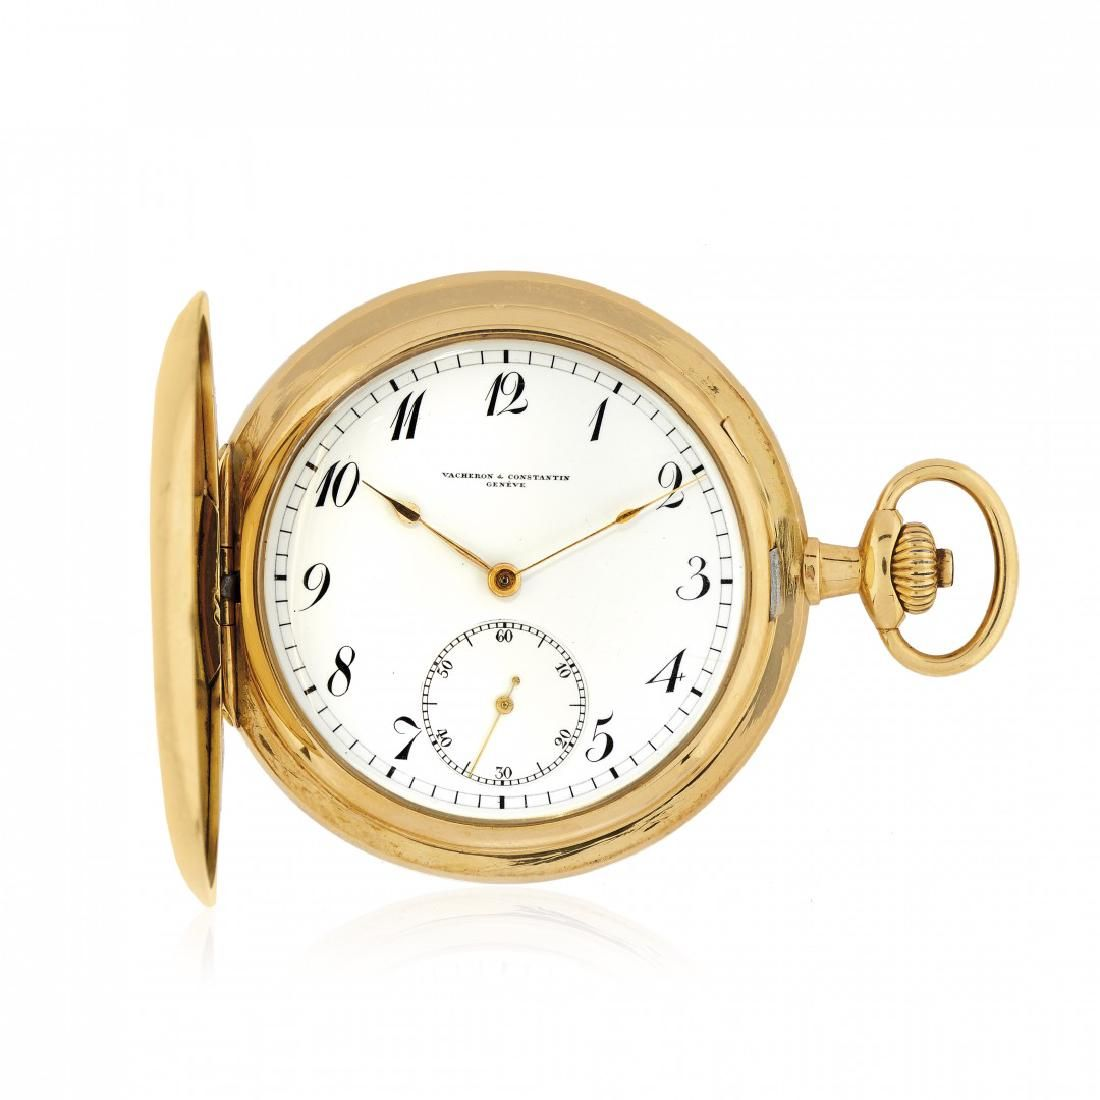 GOLD HUNTER CASE POCKET WATCH SIGNED VACHERON &